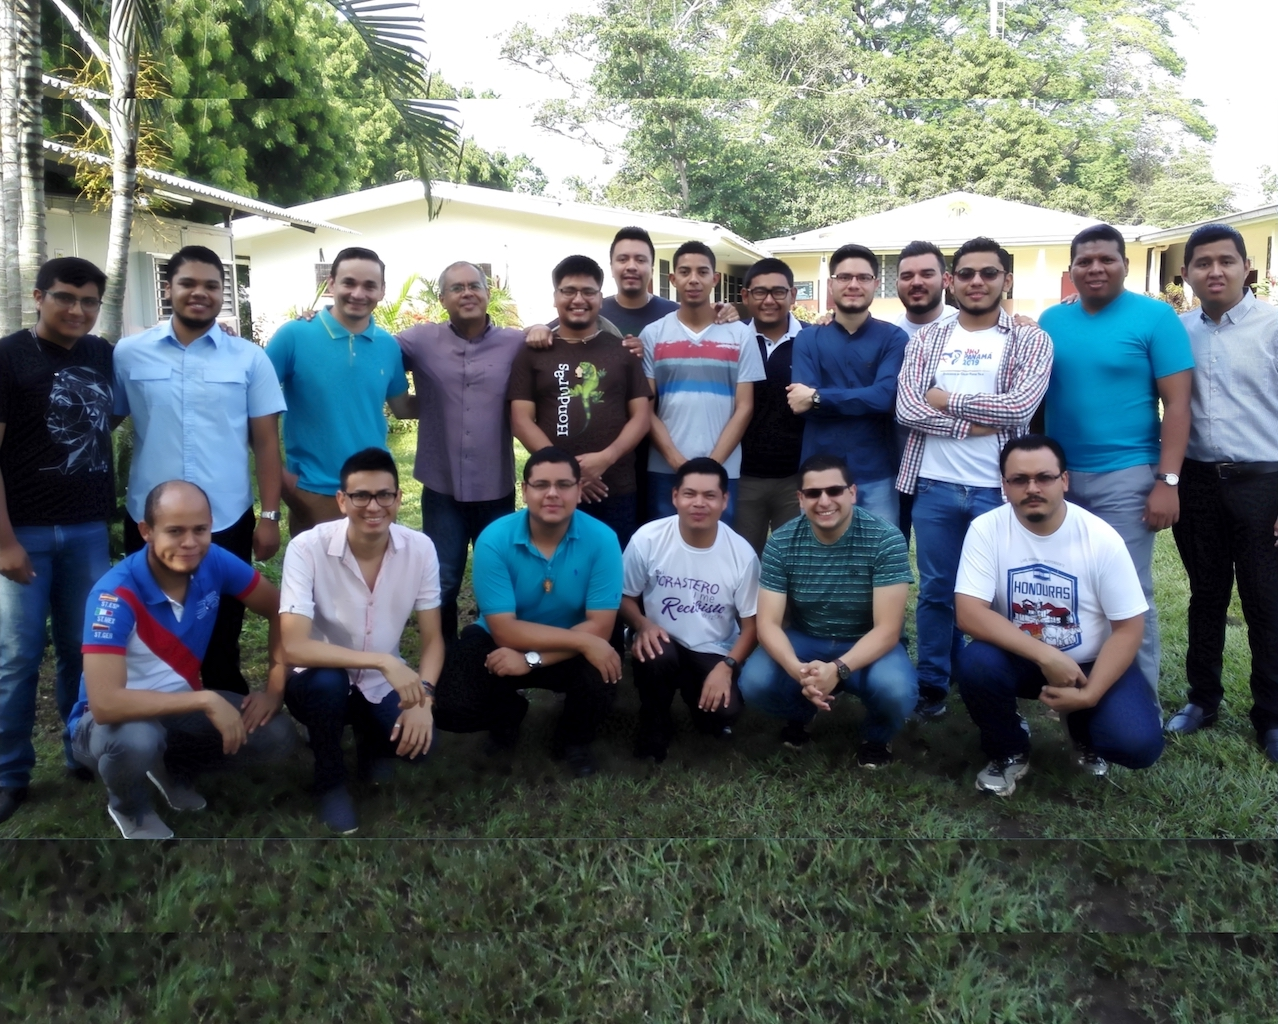 Gathering of Vincentian seminarists in Honduras - Congregation of